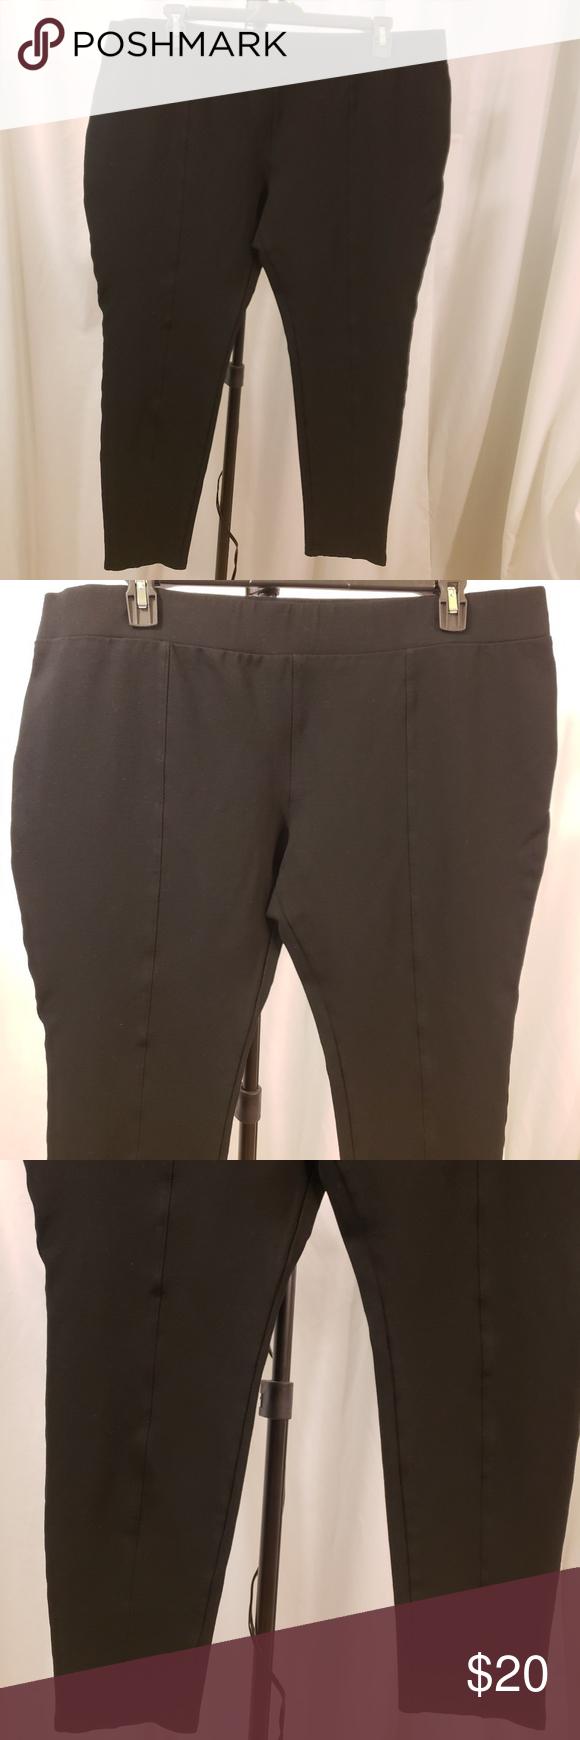 22c8136569b AVA VIV 3x black thcker tight stretch leggings NEW AVA VIV 3x black thicker  tight stretch leggings NEW front leg seam business casual brand-  avaandviv  ...